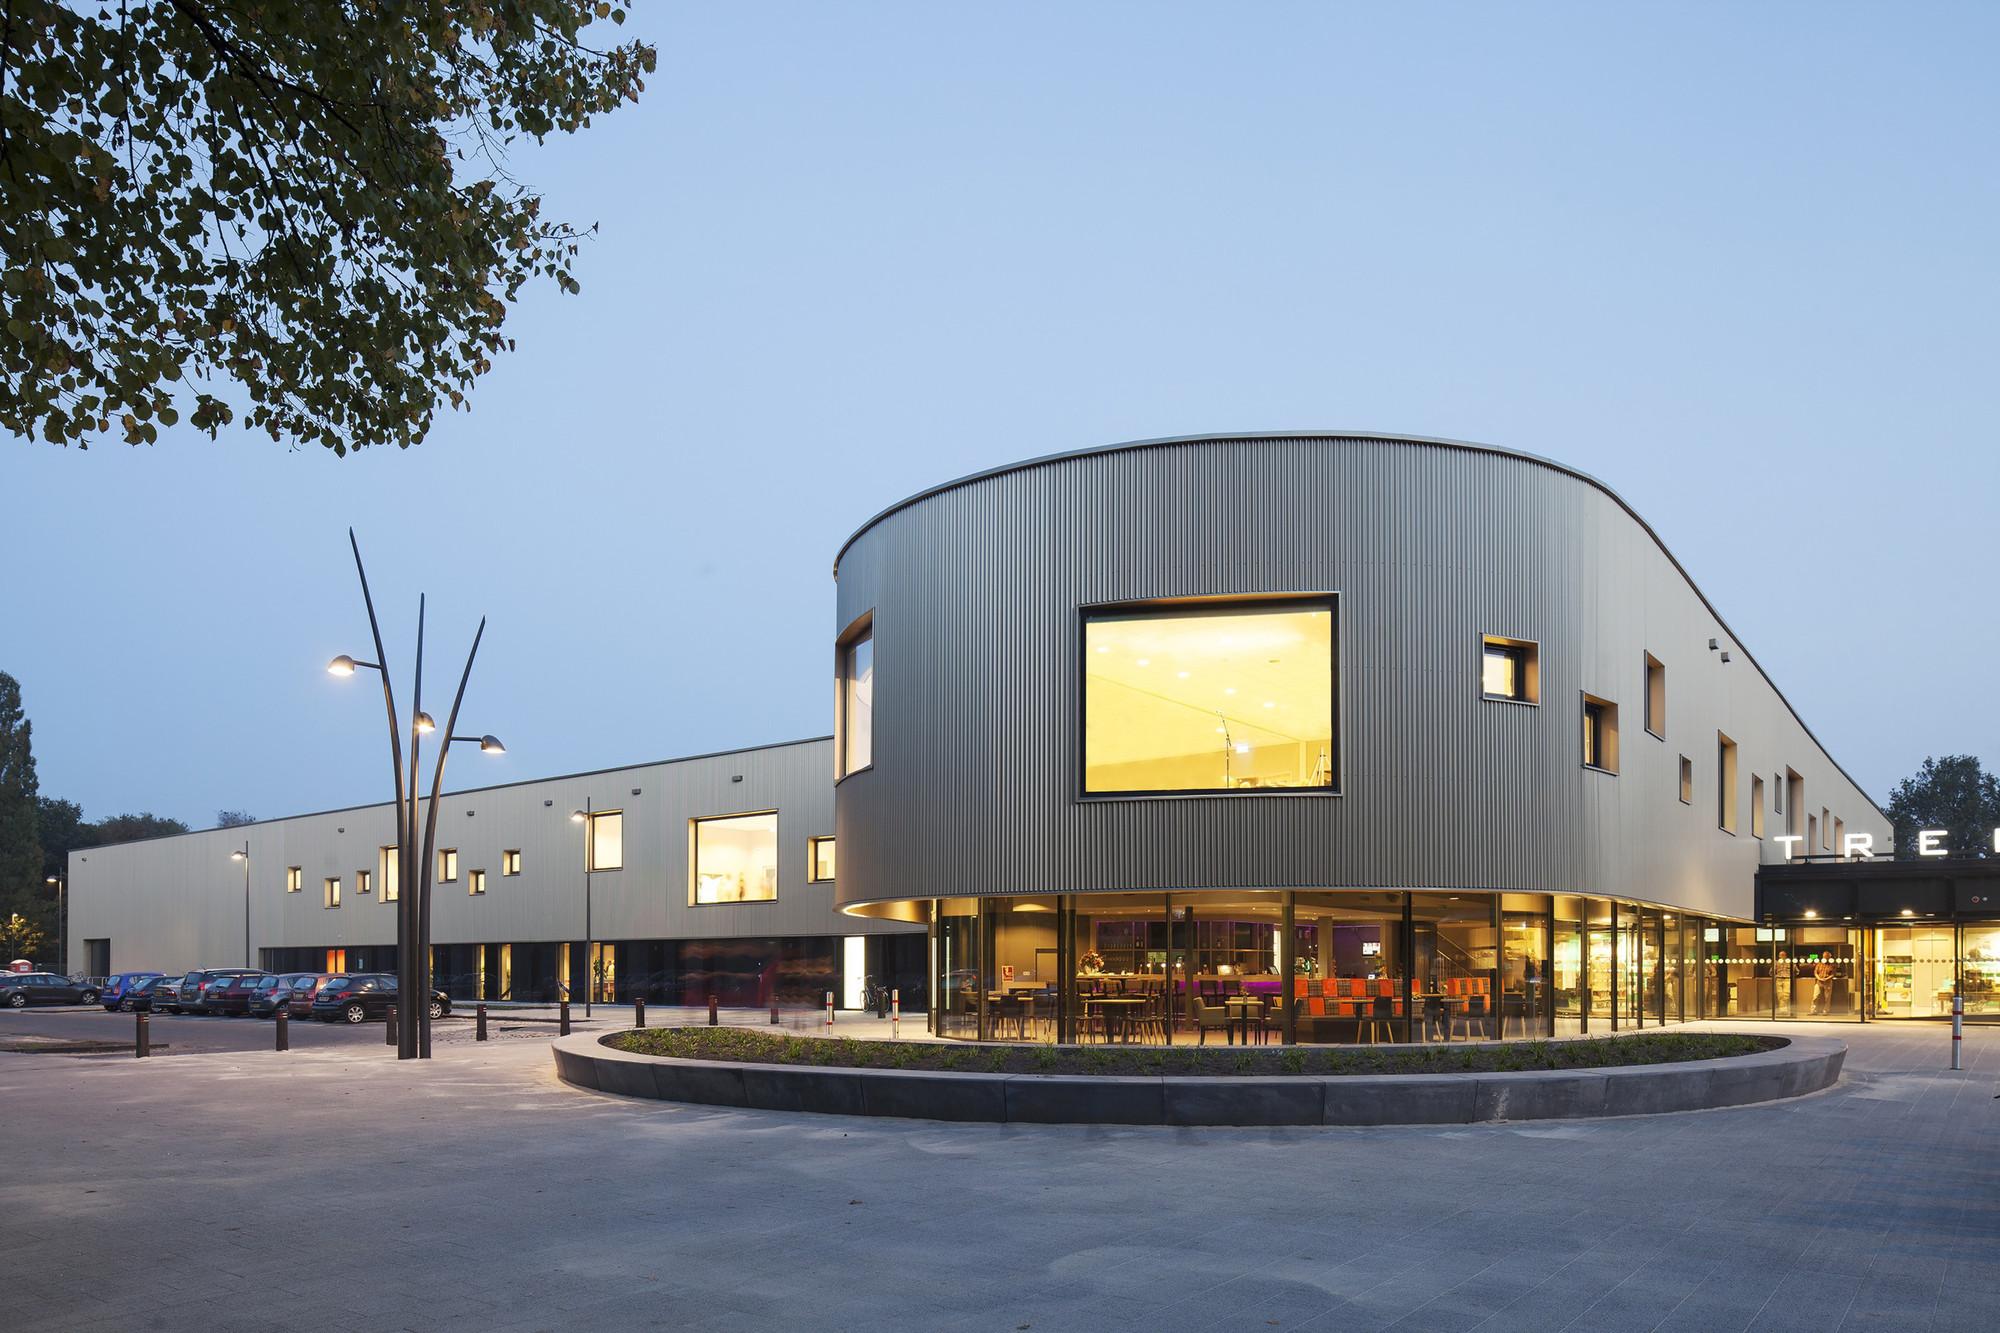 de Trefkoele+ Community Center / MoederscheimMoonen Architects  + Spring Architecten, © Luuk Kramer